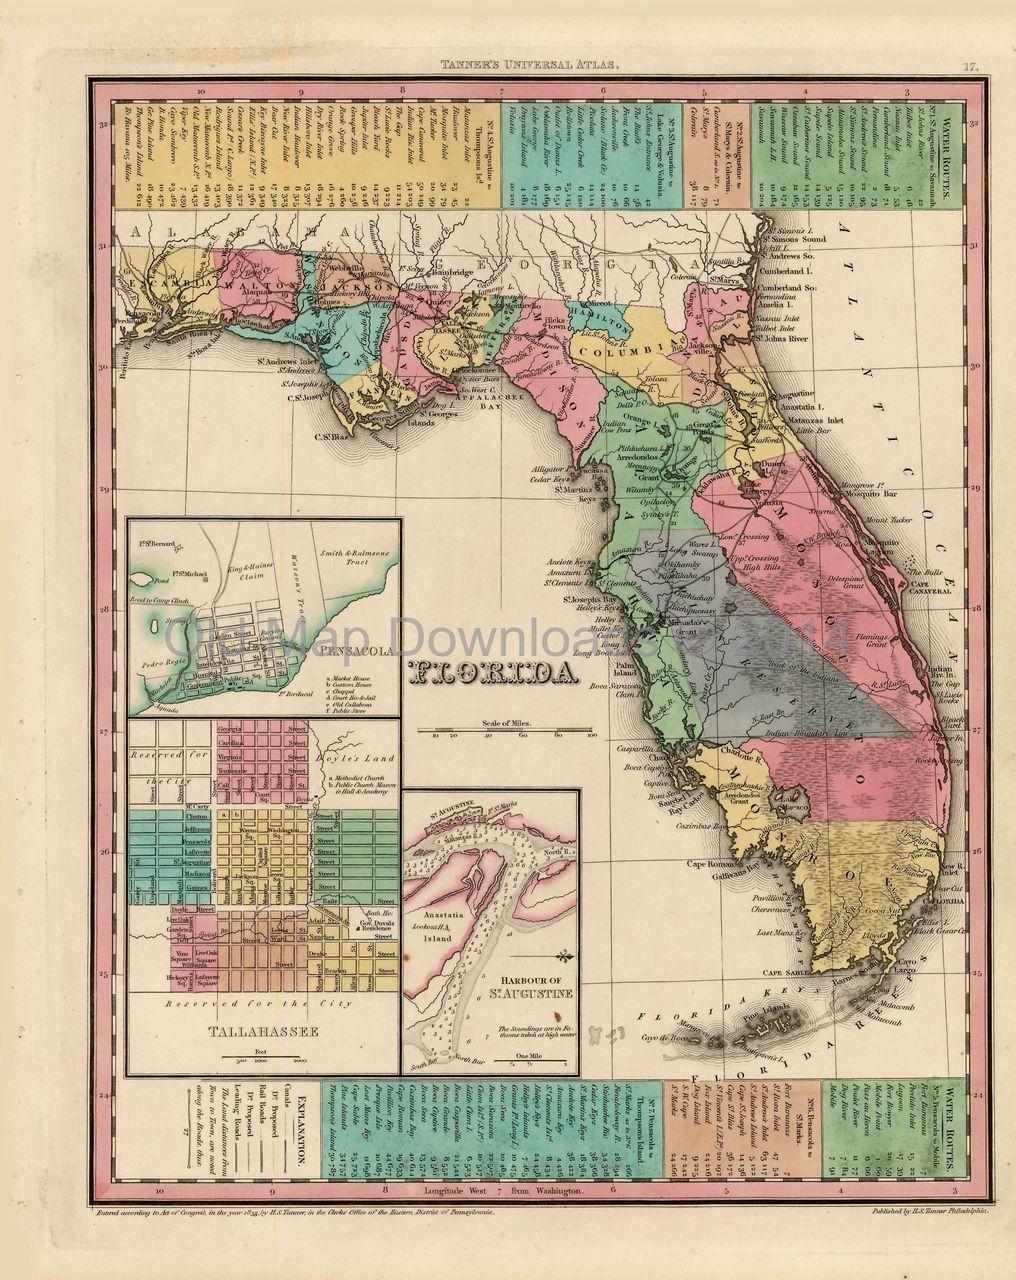 Florida Old Map Tanner 1836 Digital Image Scan Download Printable